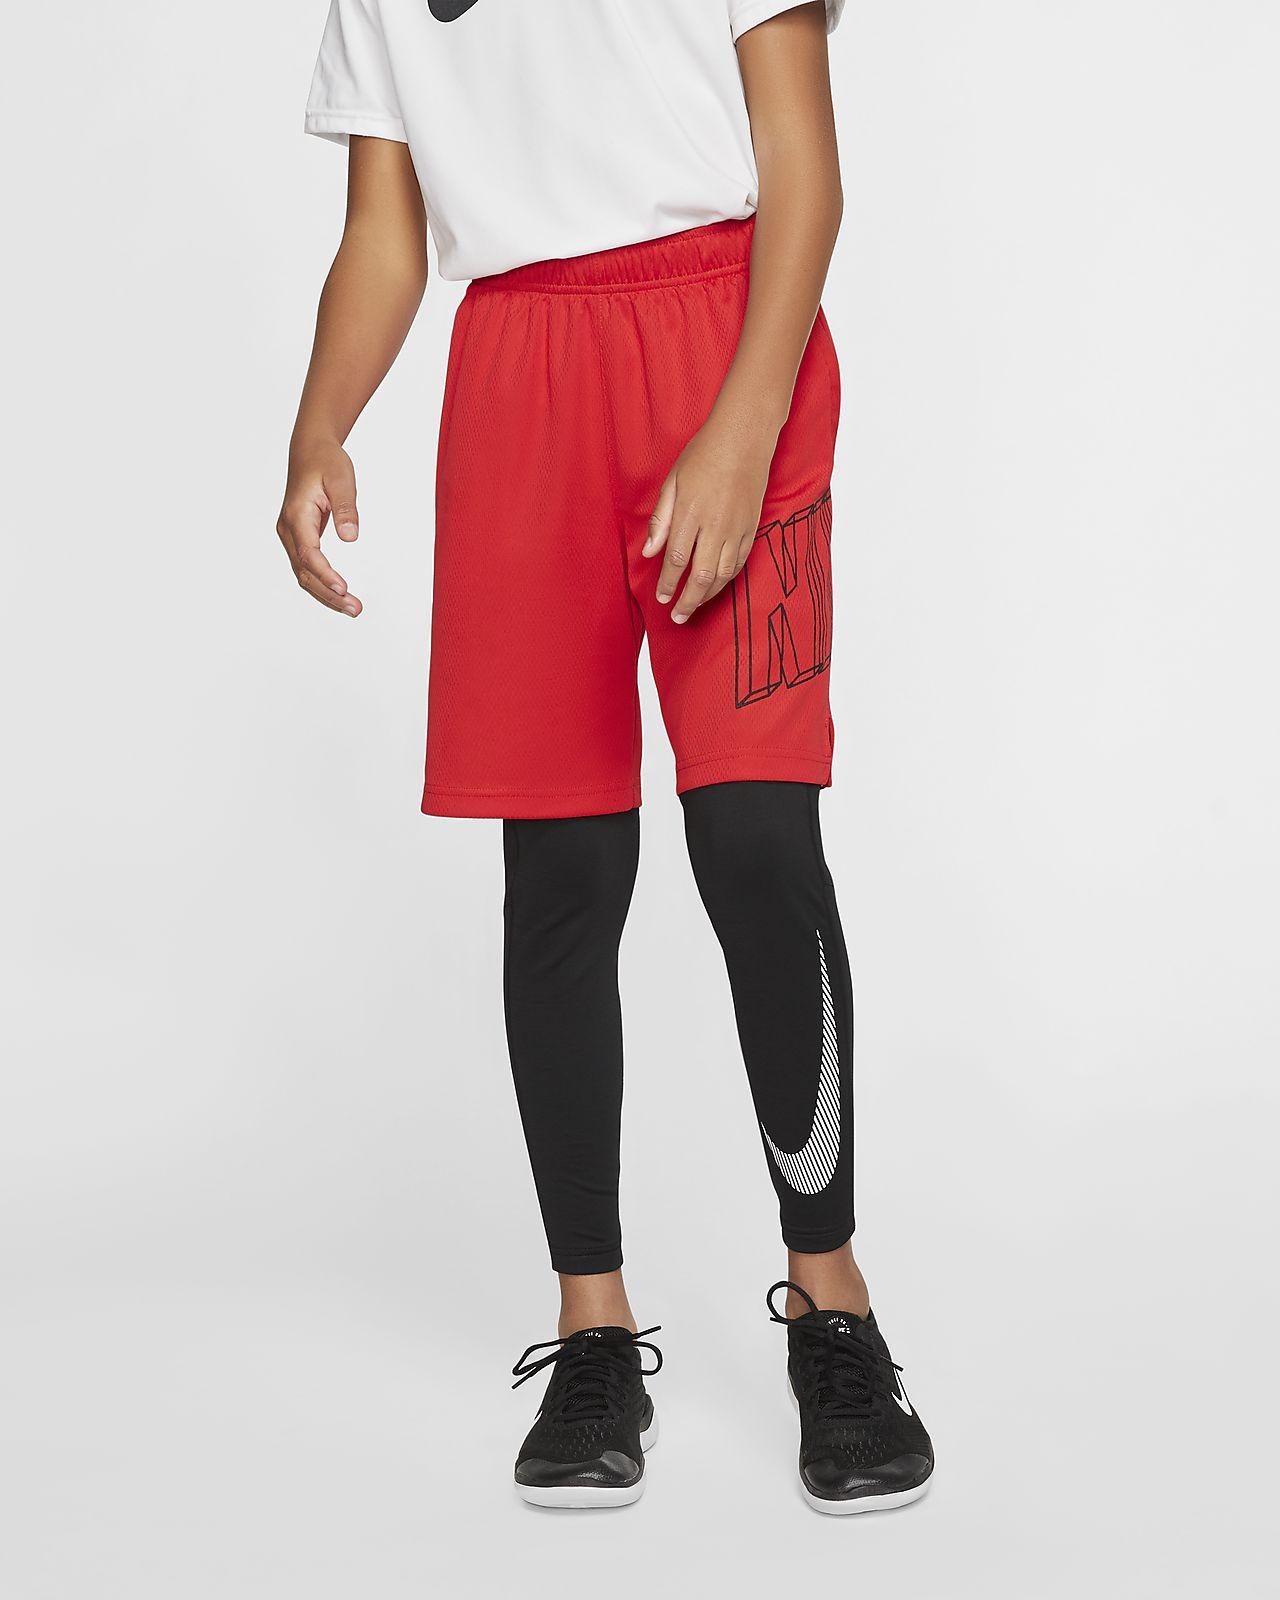 leggings shorts nike